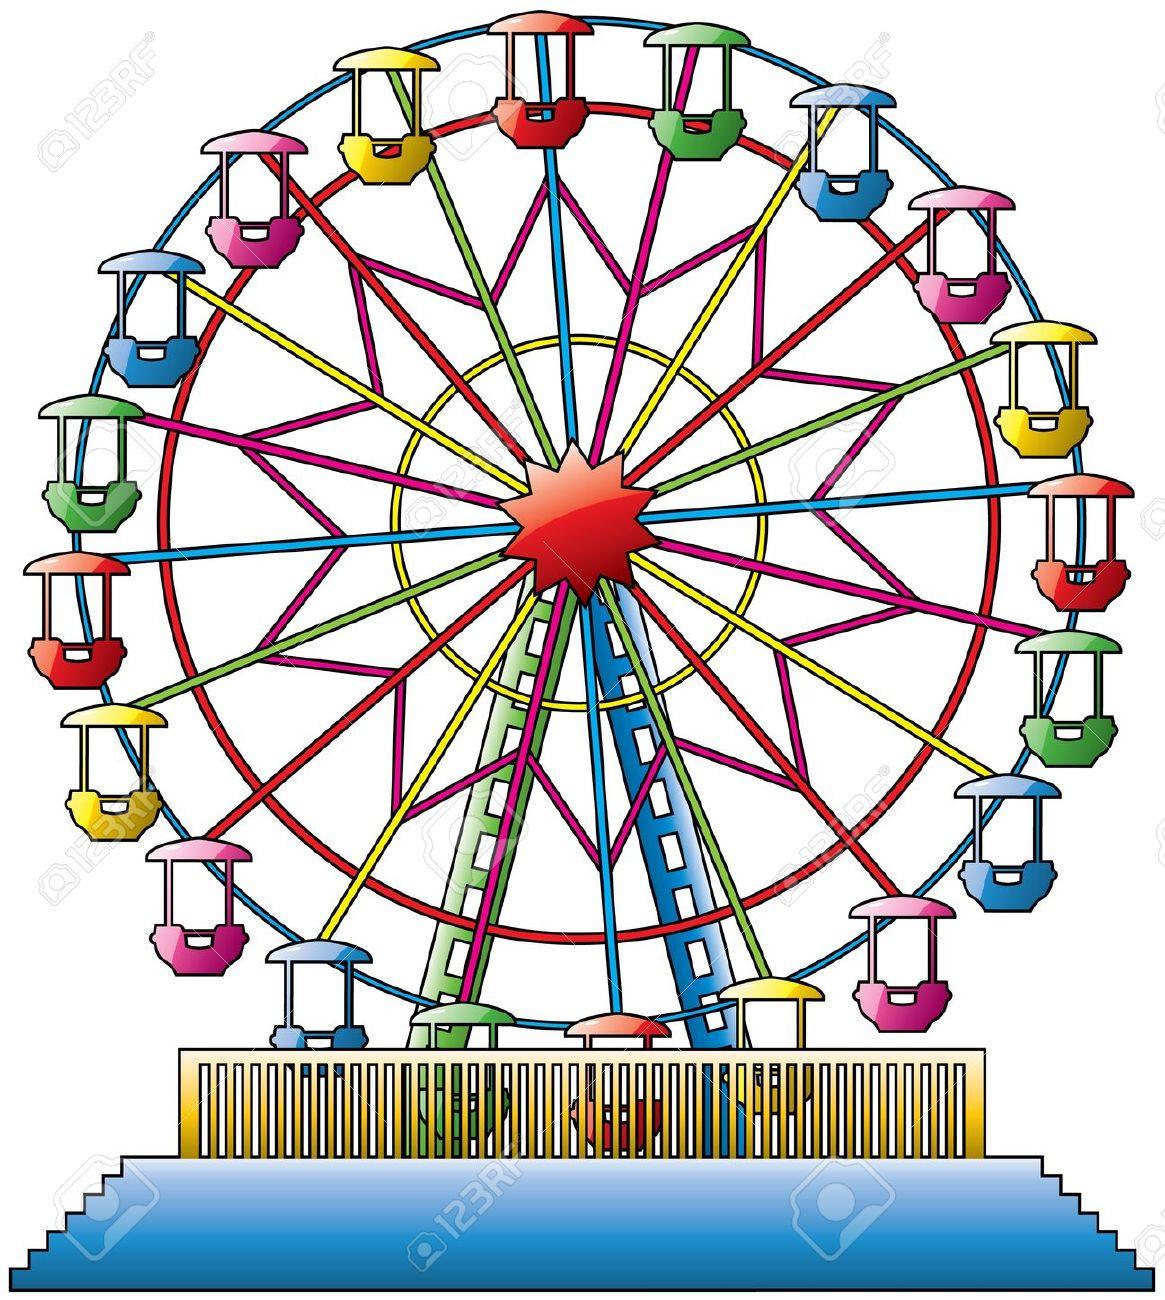 Free Ferris Wheel Cliparts, Download Free Clip Art, Free.